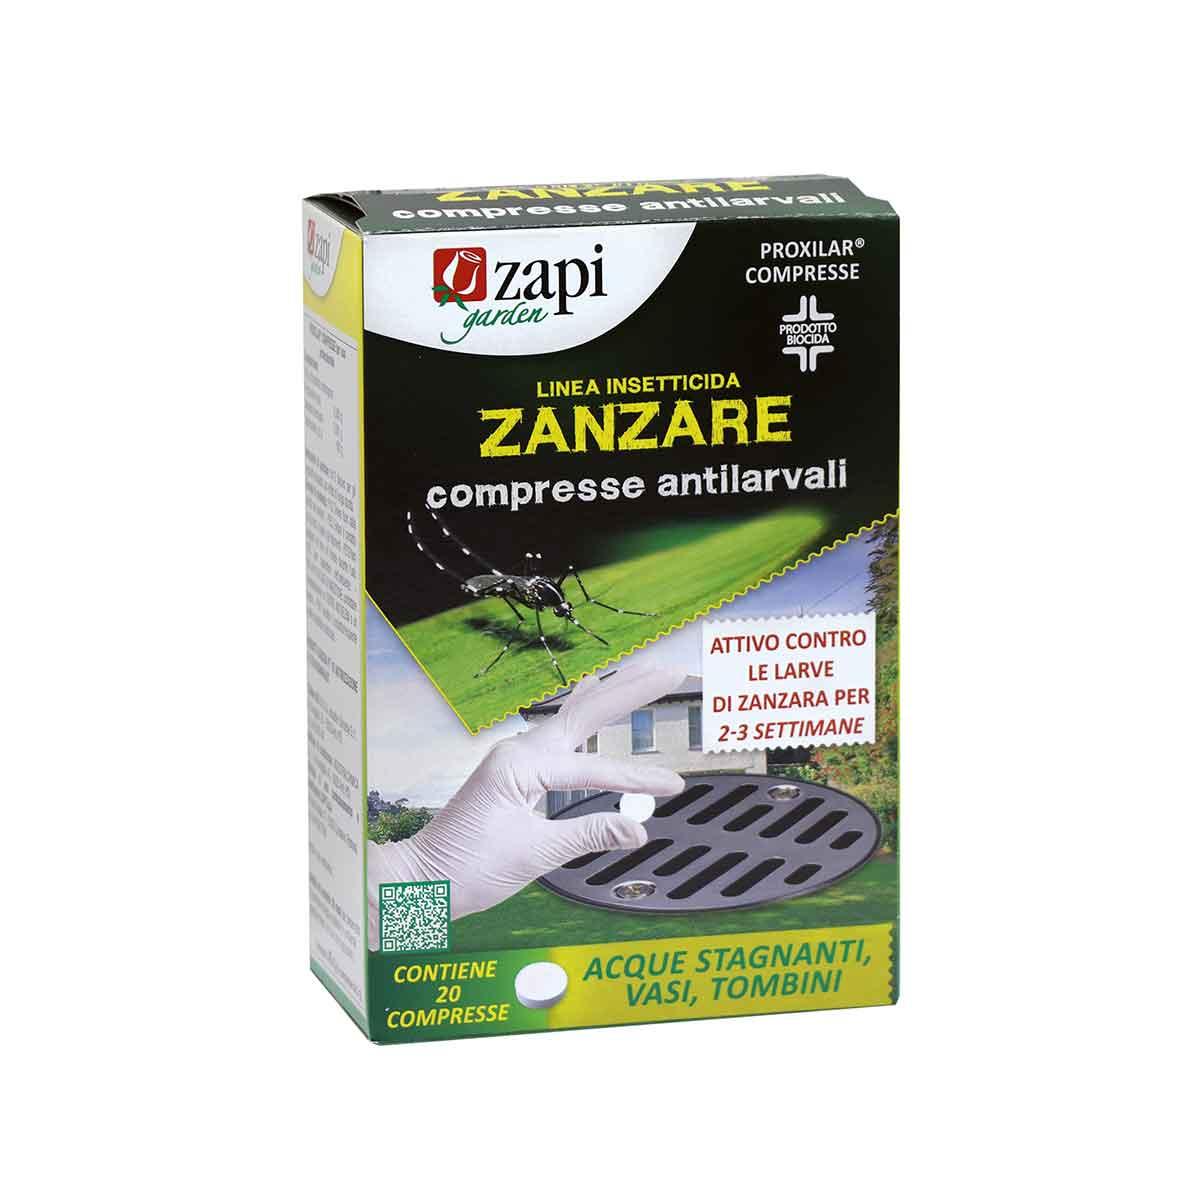 Zapi anti zanzare compresse antilarvali B.I.A.